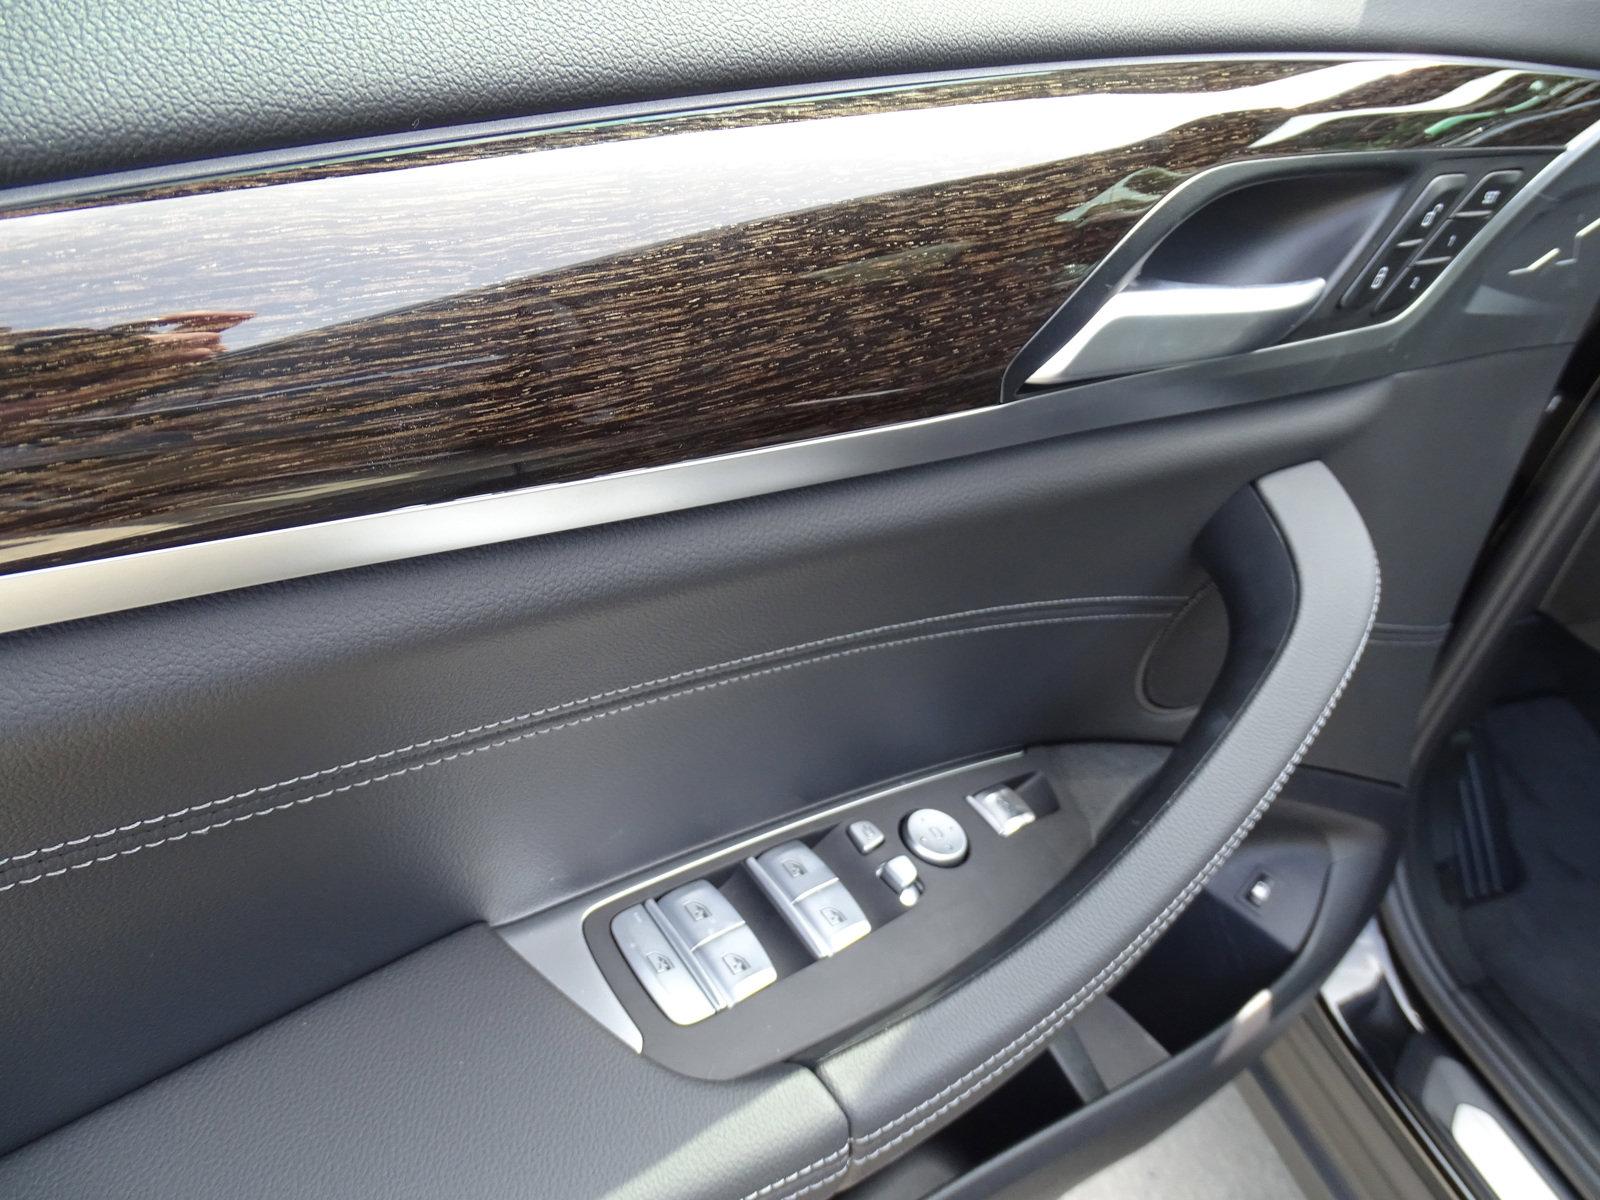 Pre-Owned 2021 BMW X3 xDrive30e